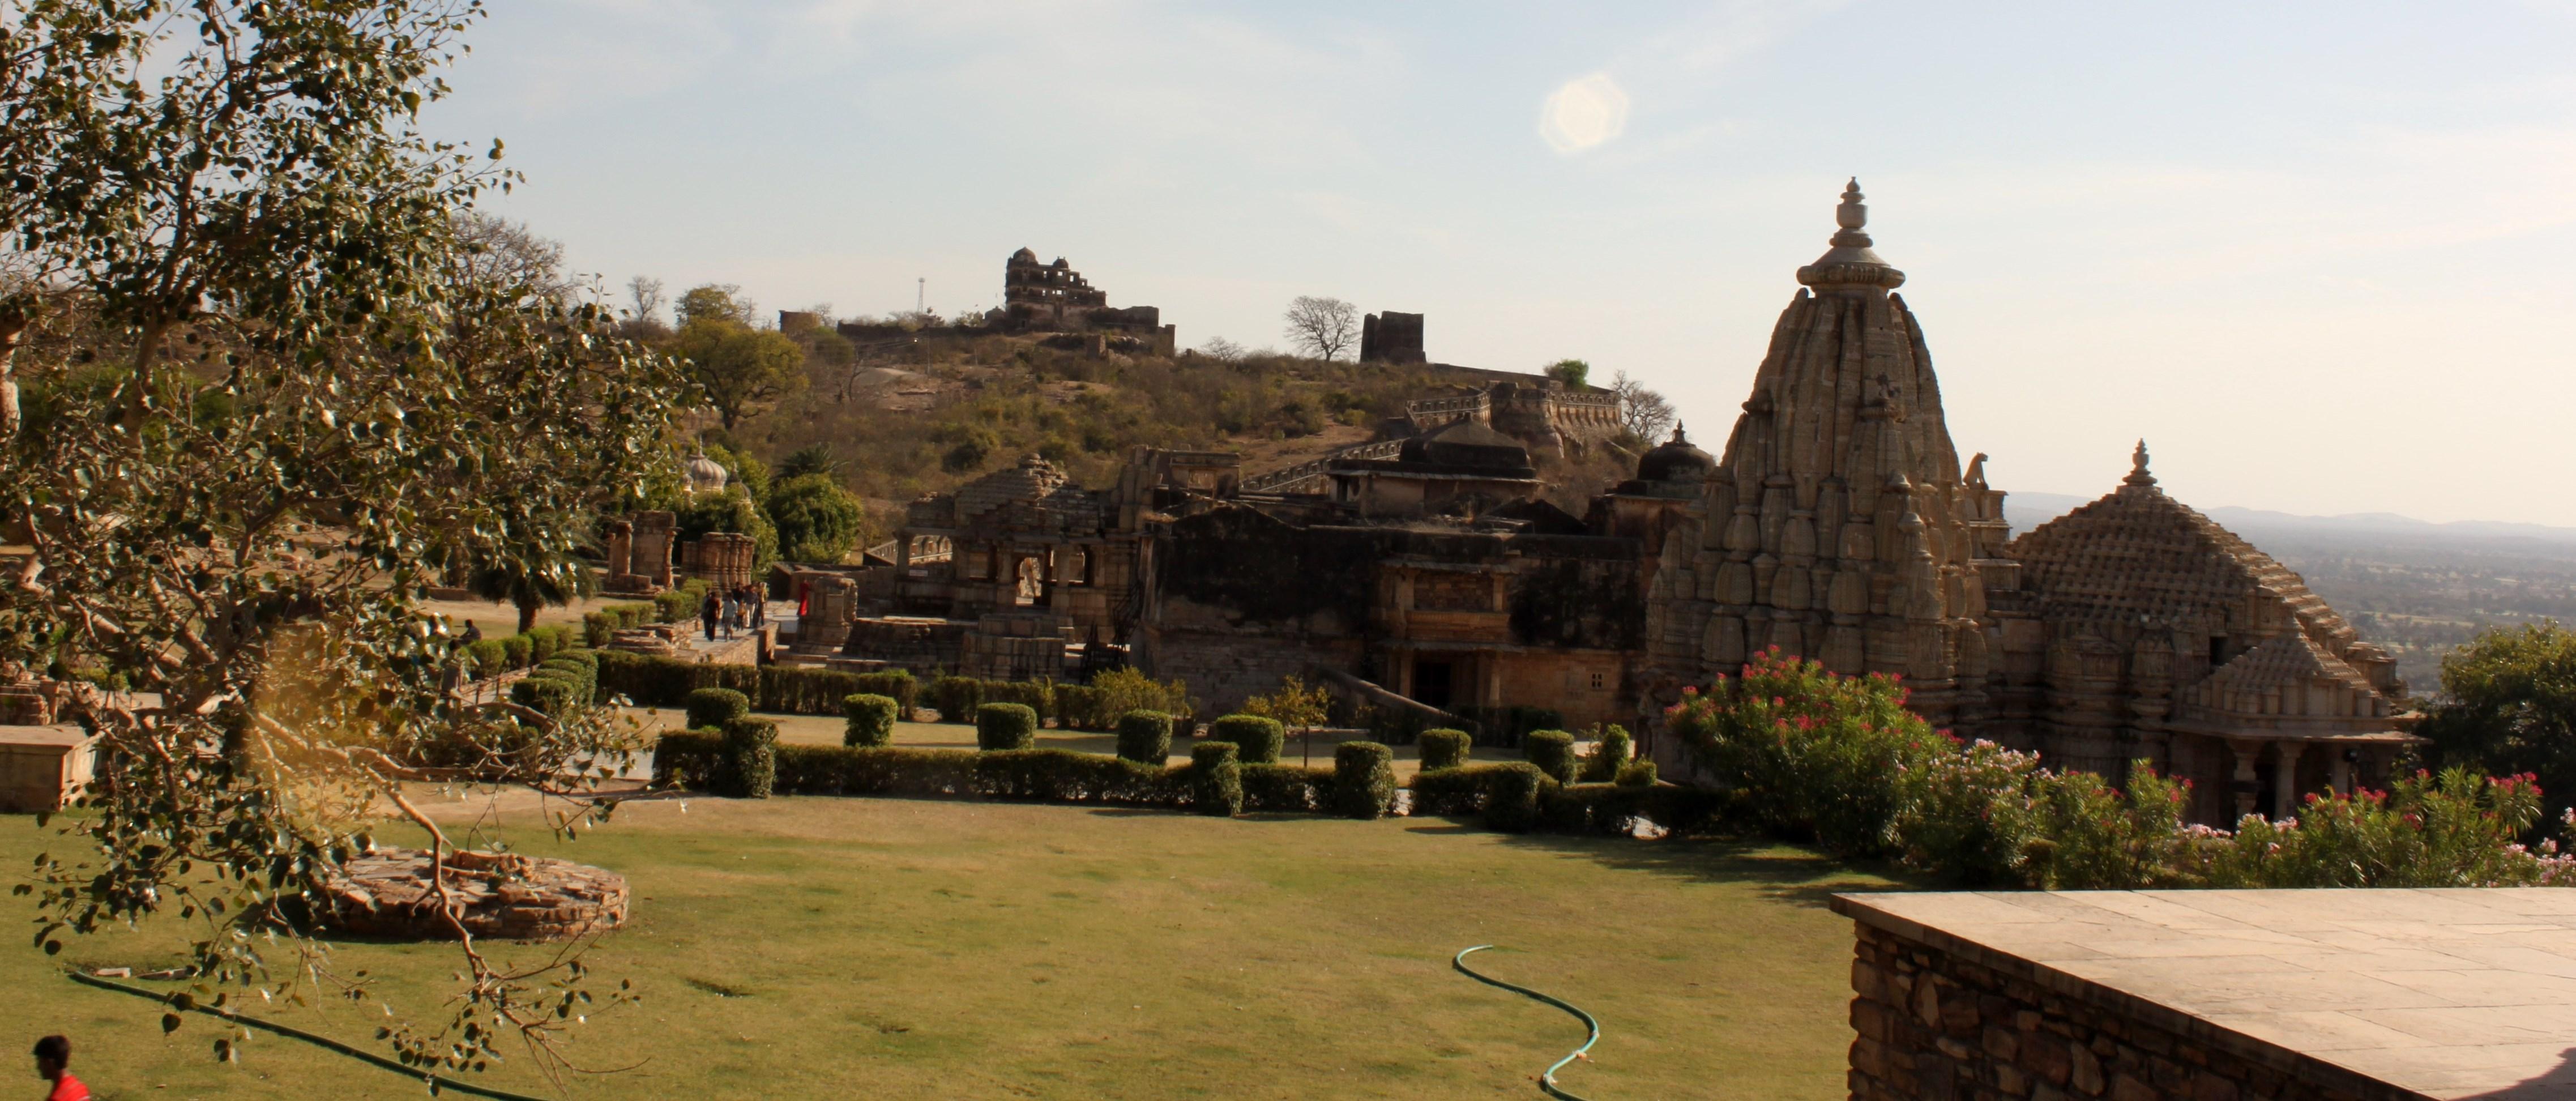 Temples around Gaumukh